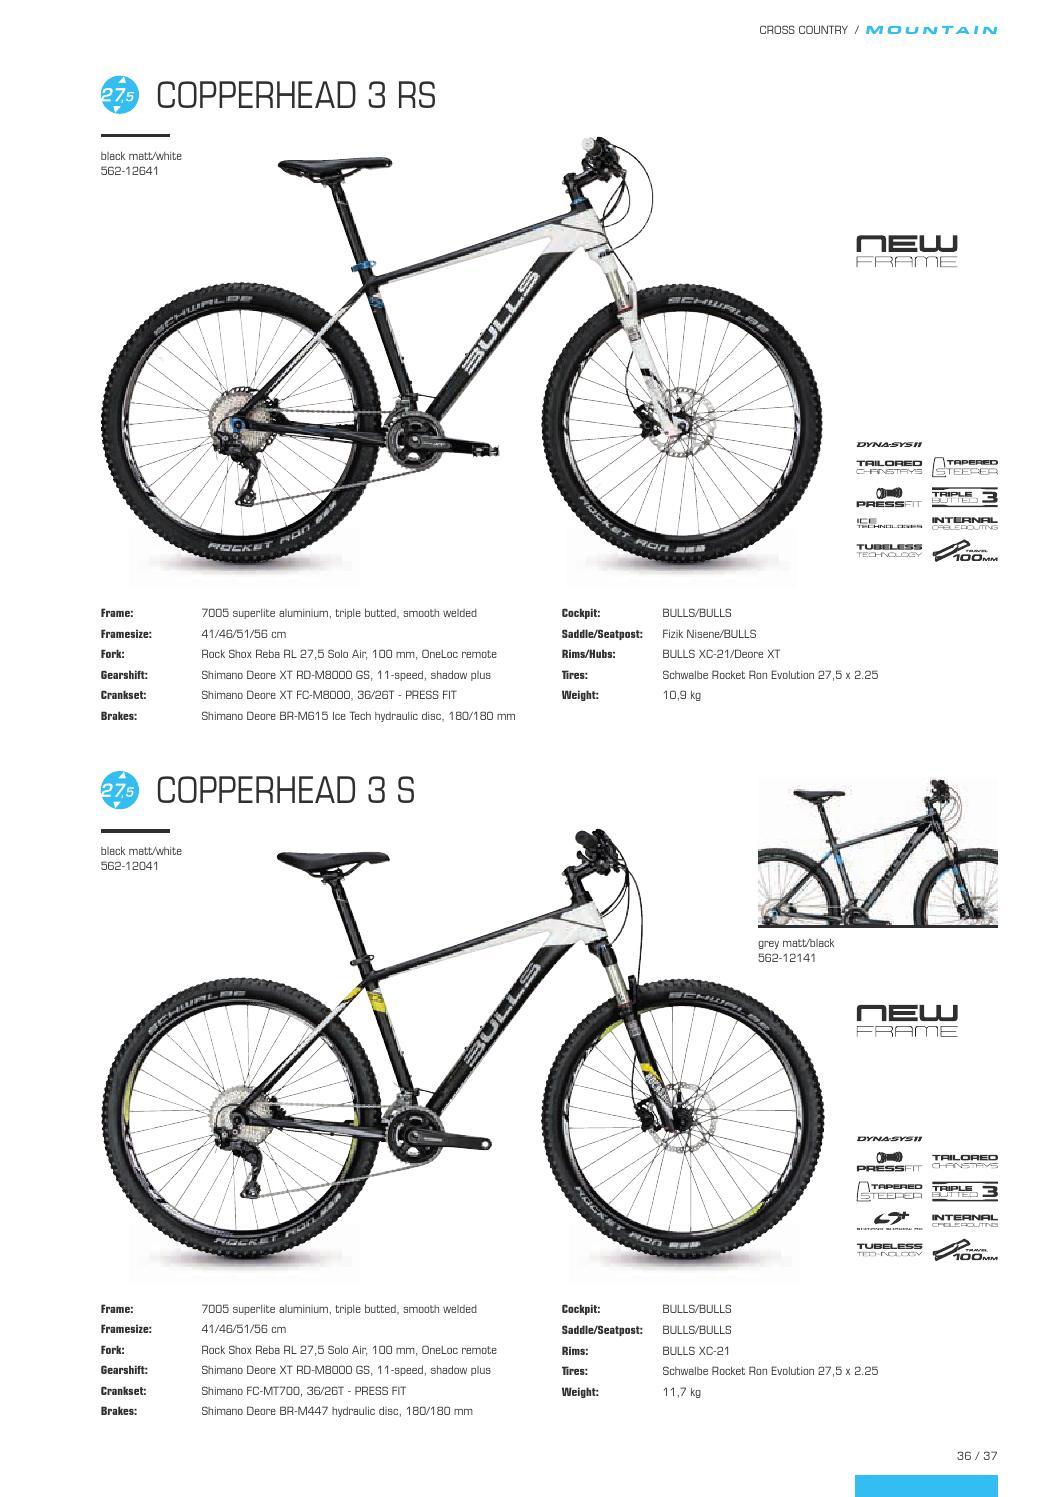 Catalogo Bulls Bike 2016 by BikeMTB.net - issuu